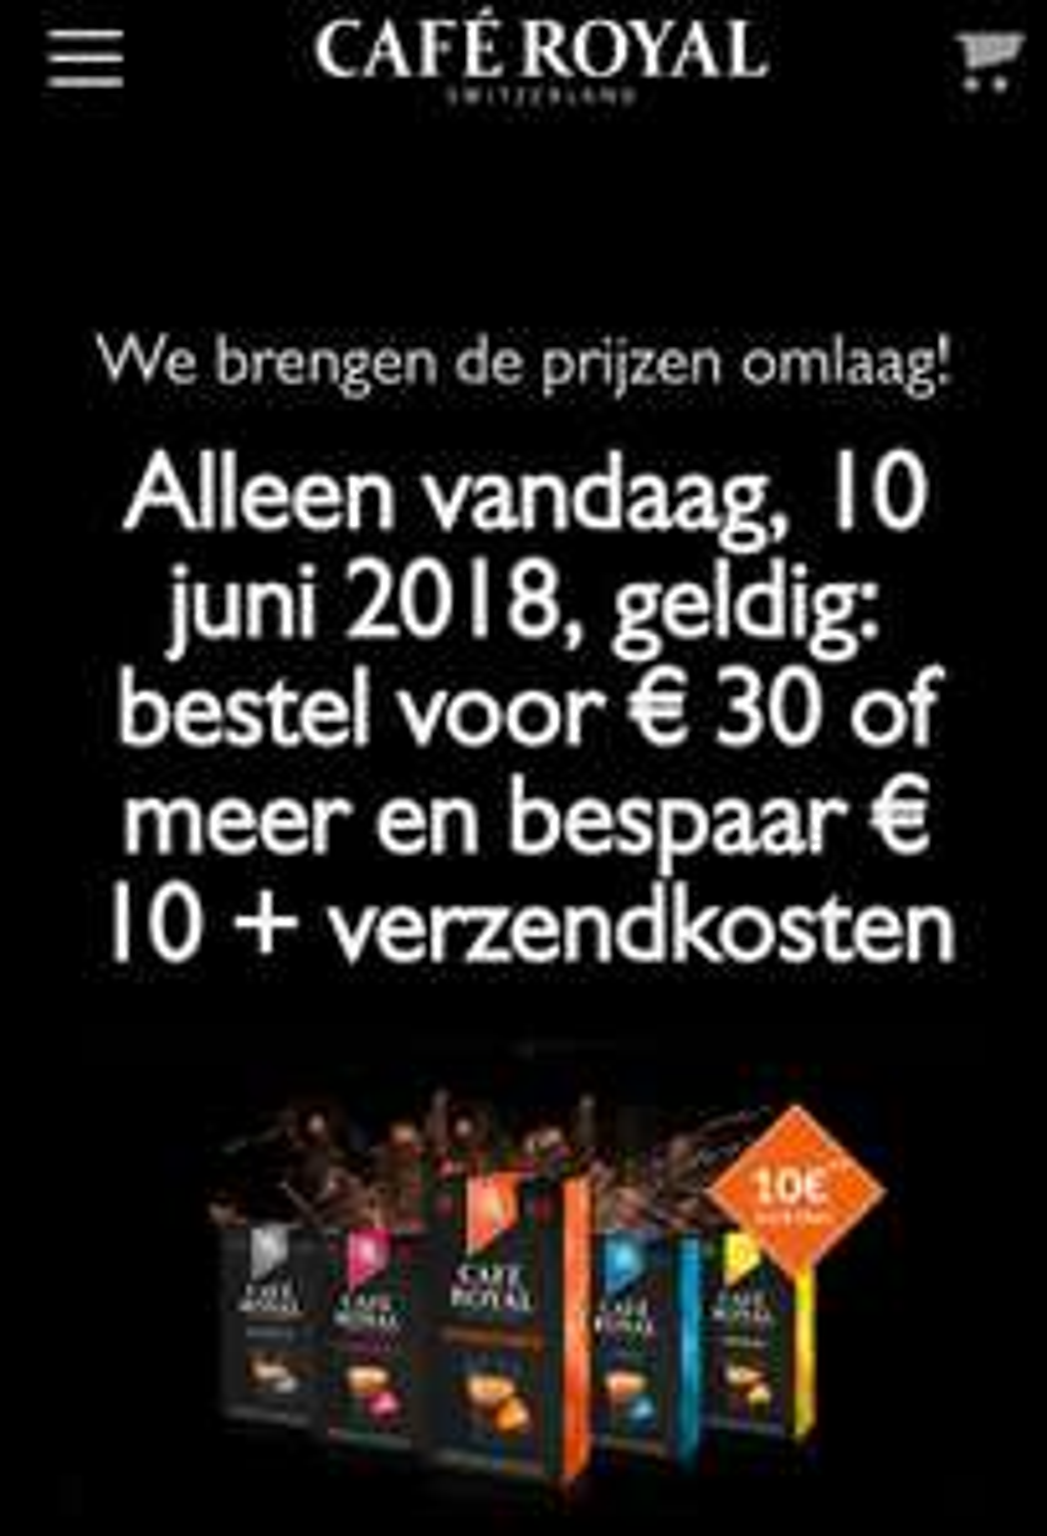 €10 korting + gratis verzending vanaf 30 euro bij Café Royal.